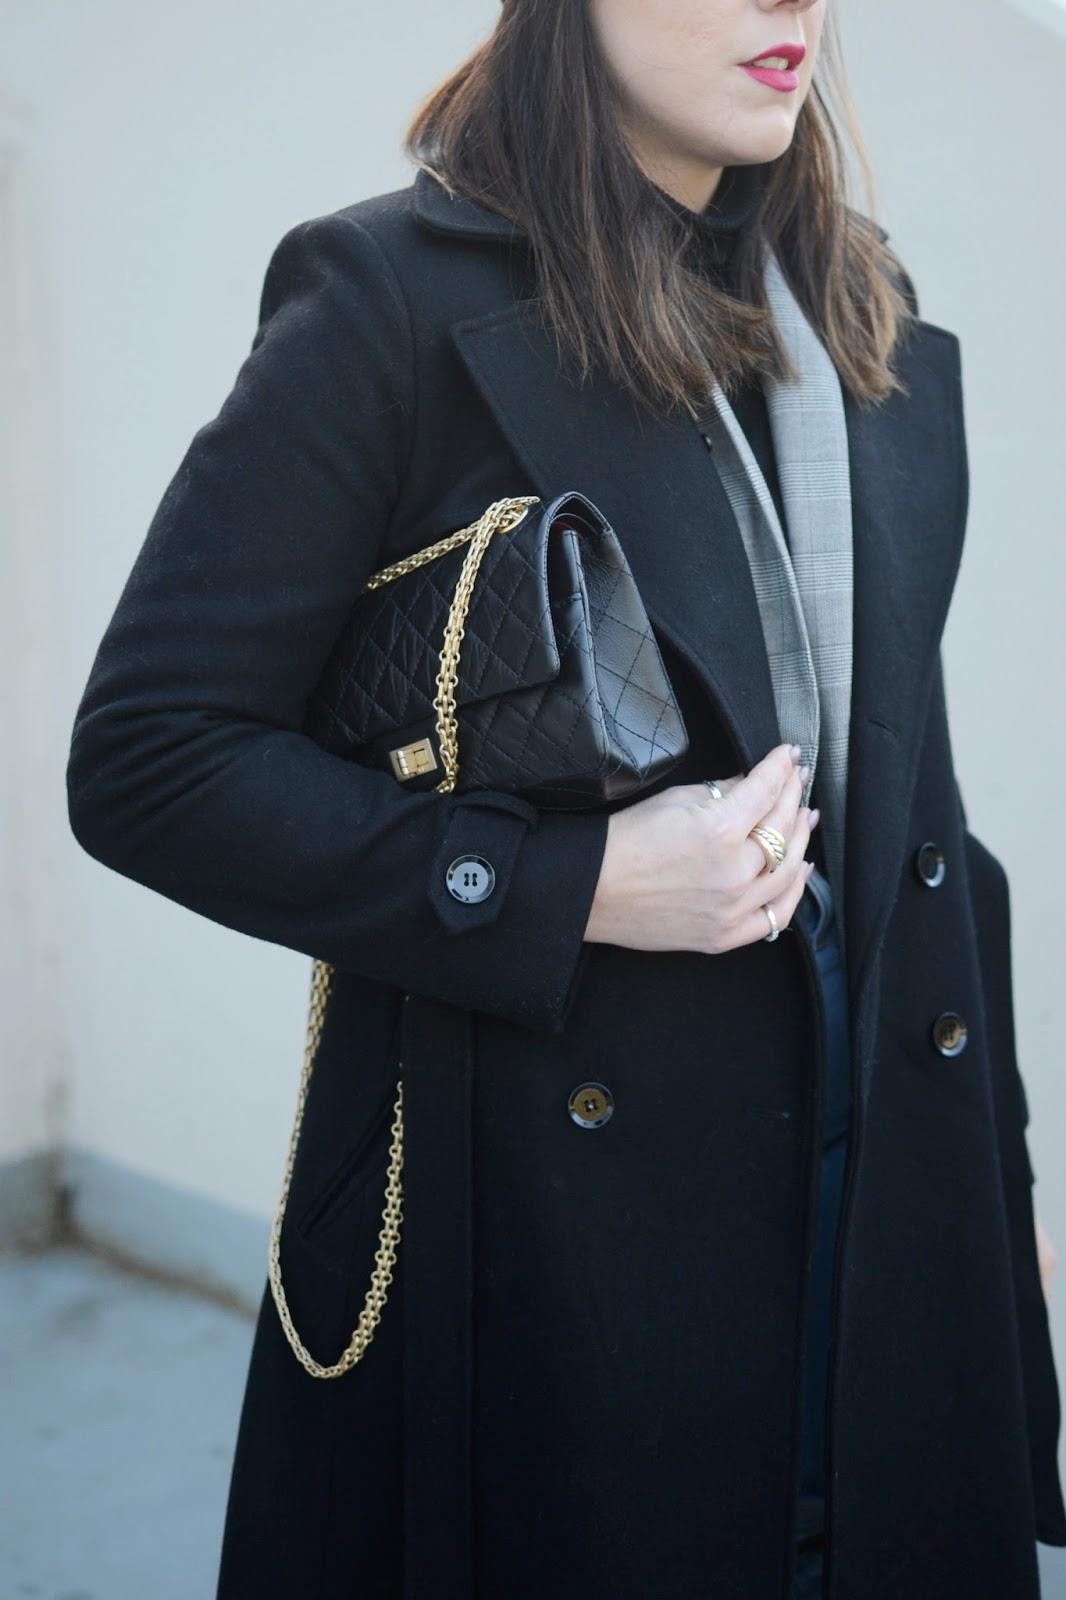 Le Chateau coat layered outfit glen plaid blazer levis wedgie jeans vancouver fashion blogger aleesha harris